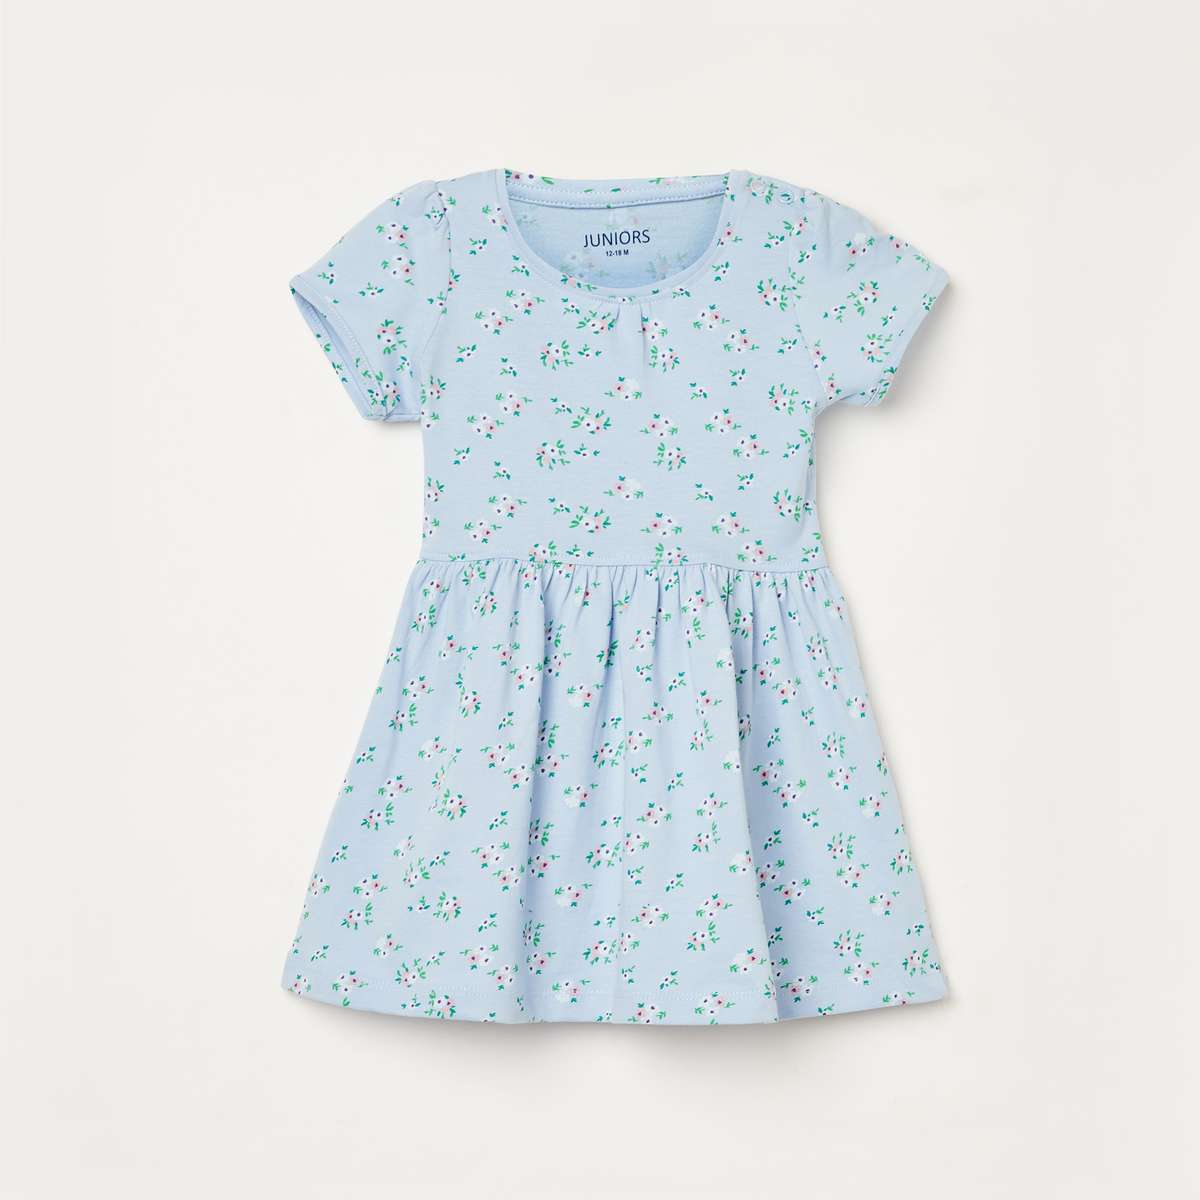 3.JUNIORS Girls Printed A-line Dress